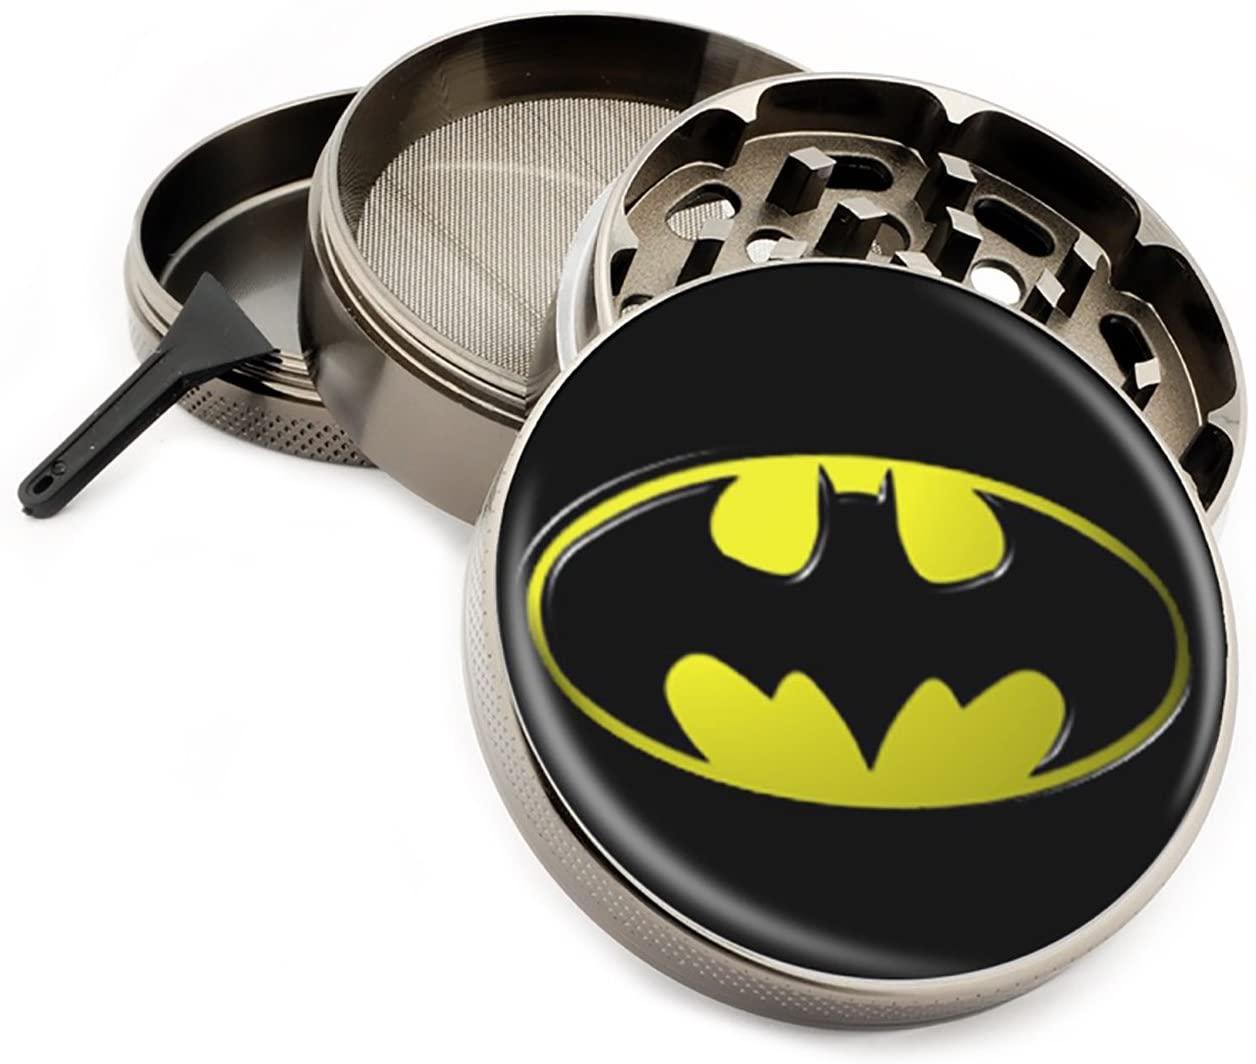 Star Wars & Superhero Themed 4 Layer Herb Grinders with Bonus Scraper (Batman)